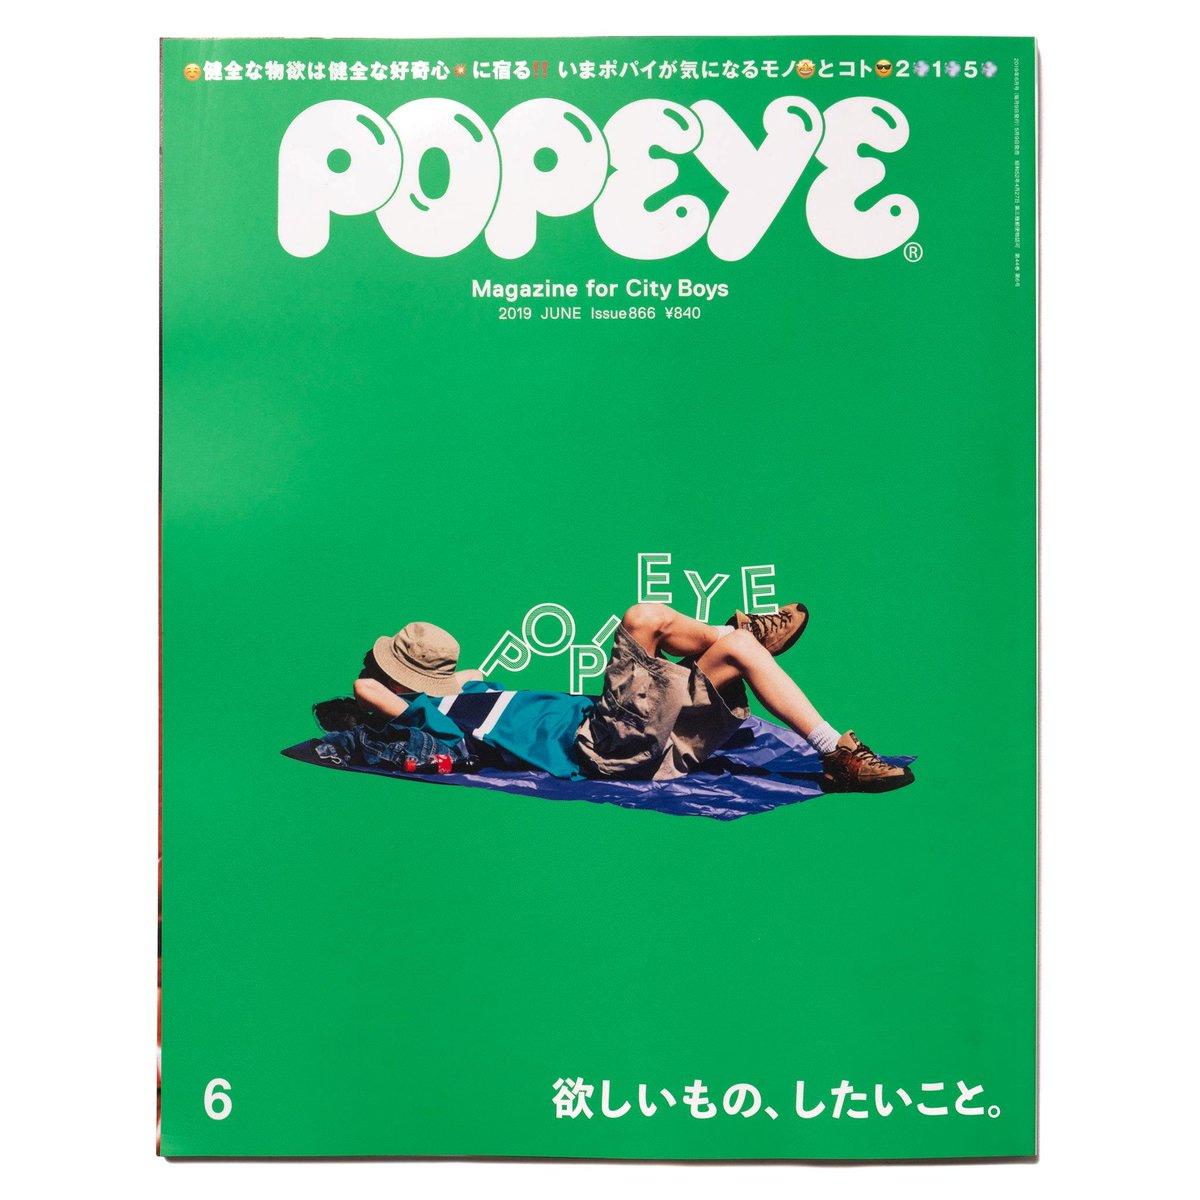 Image result for popeye magazine april 2013